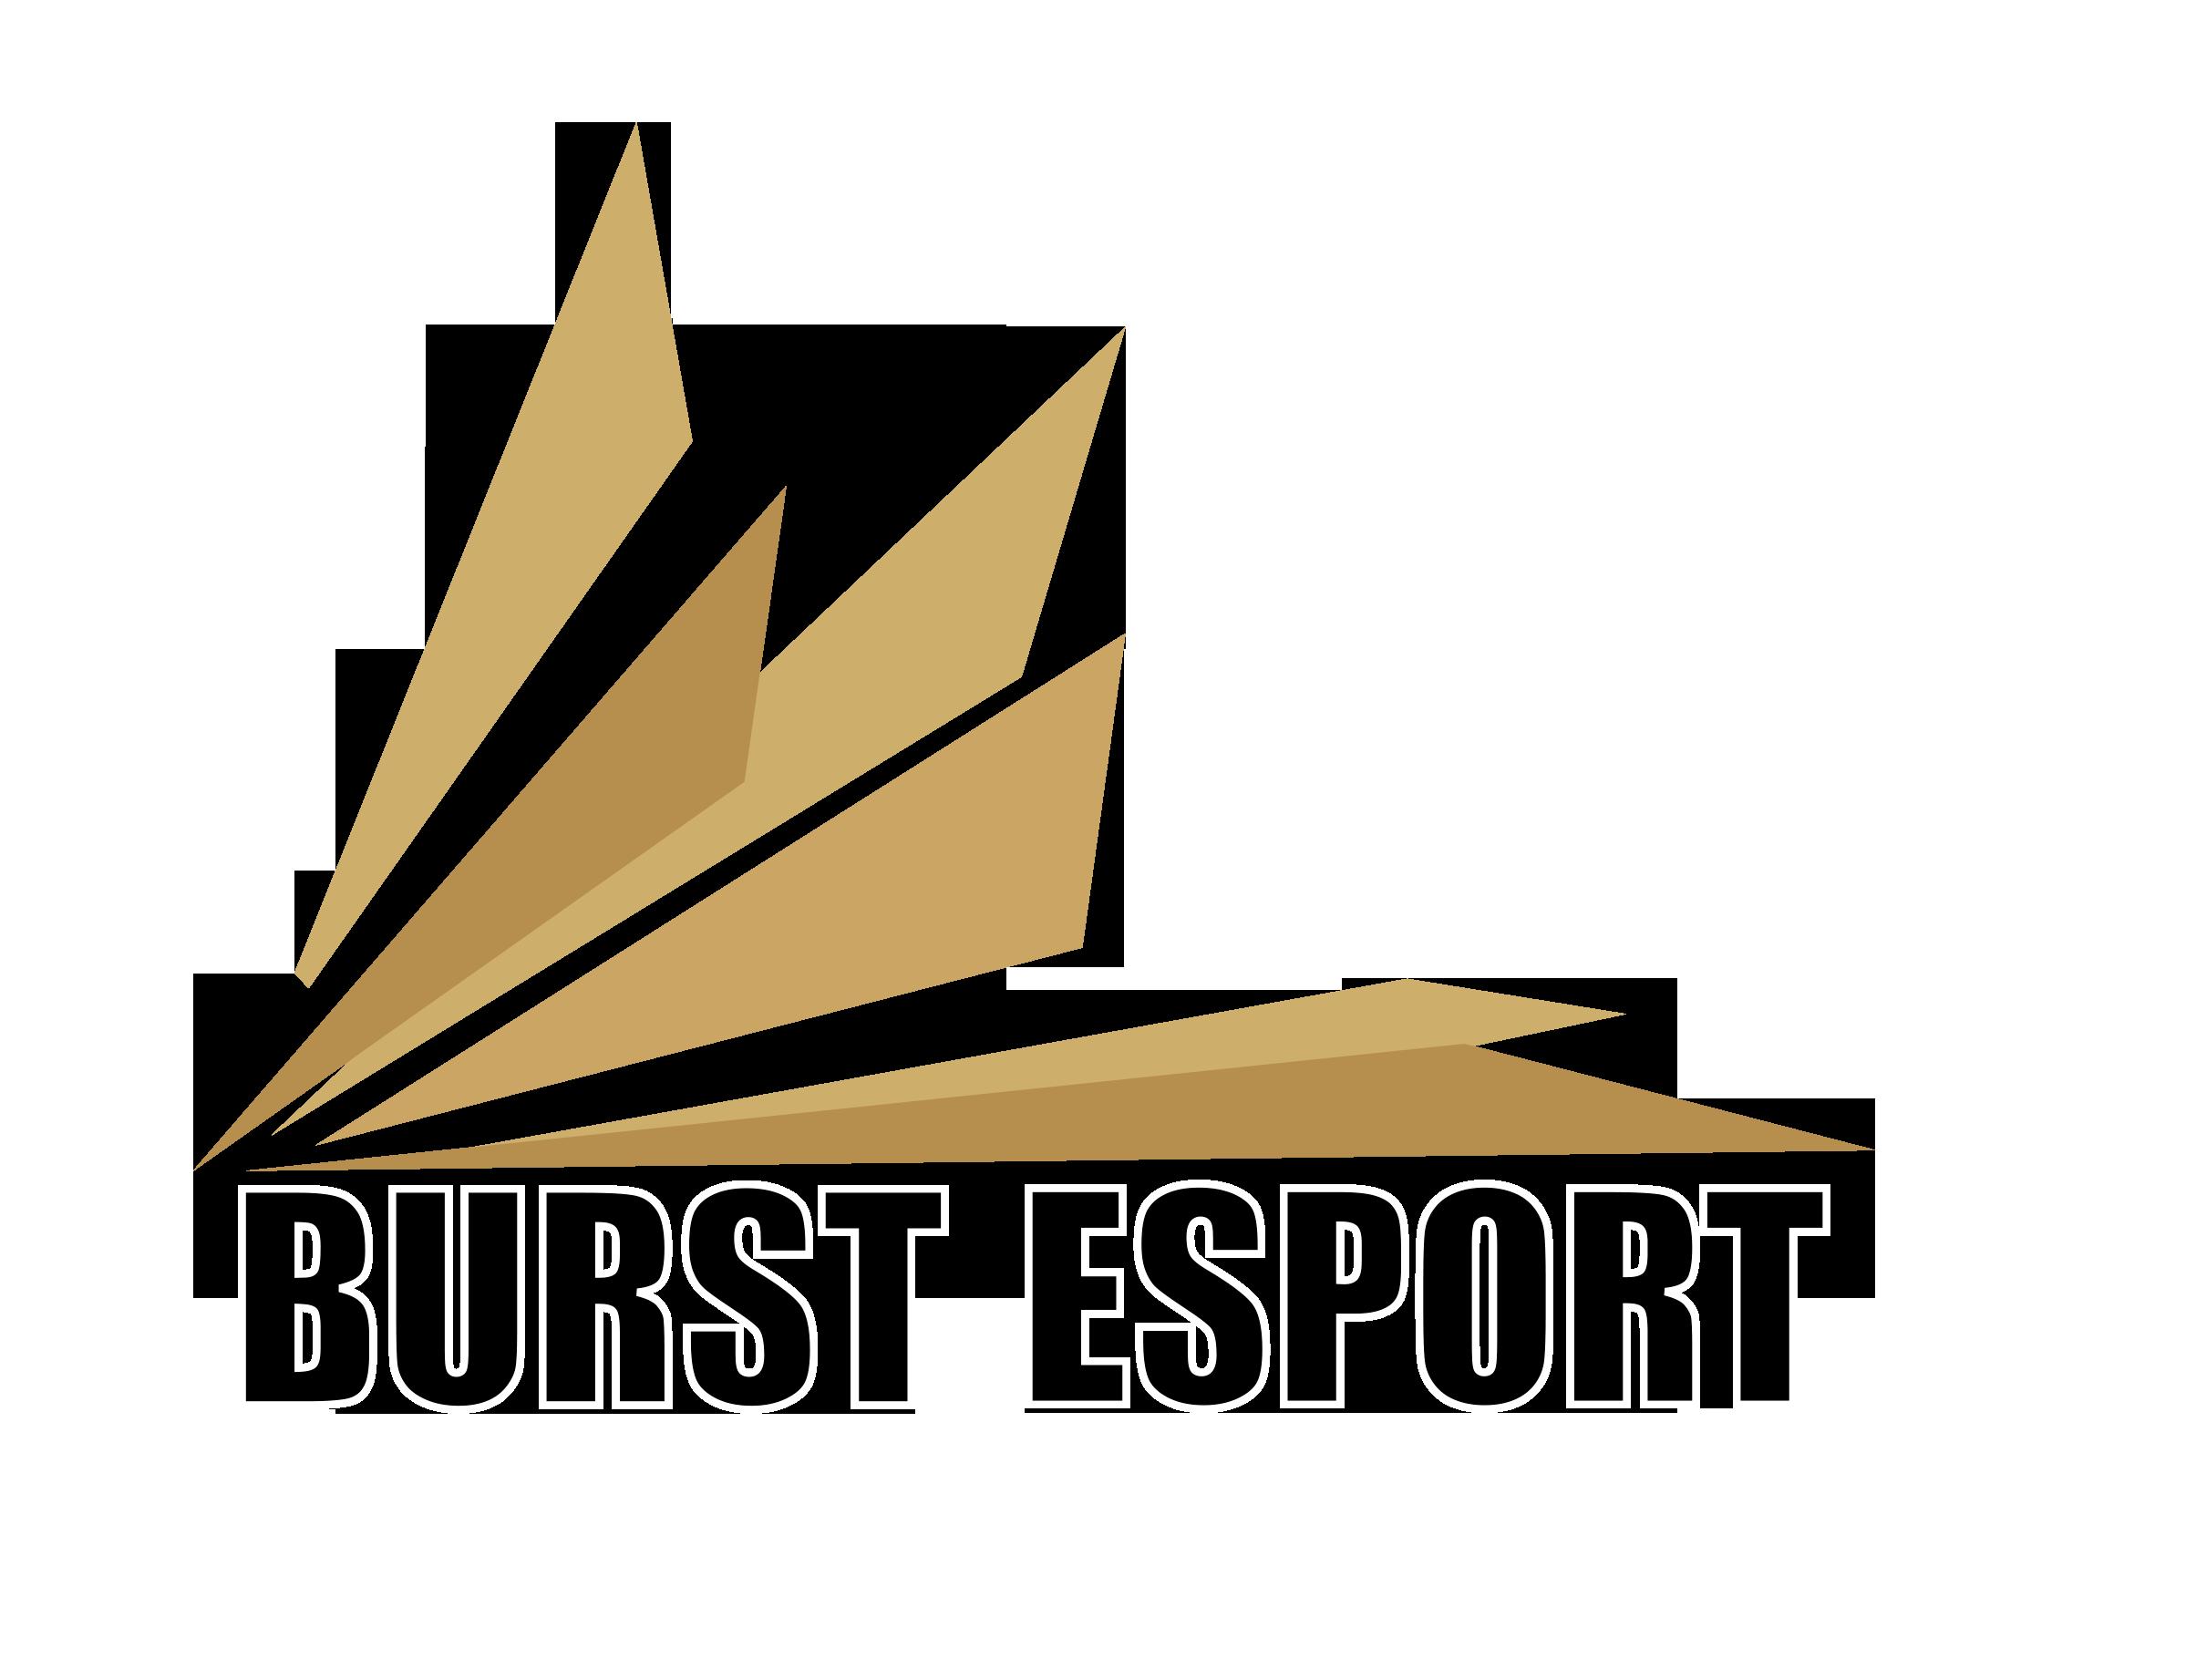 Burst_Esport_logo